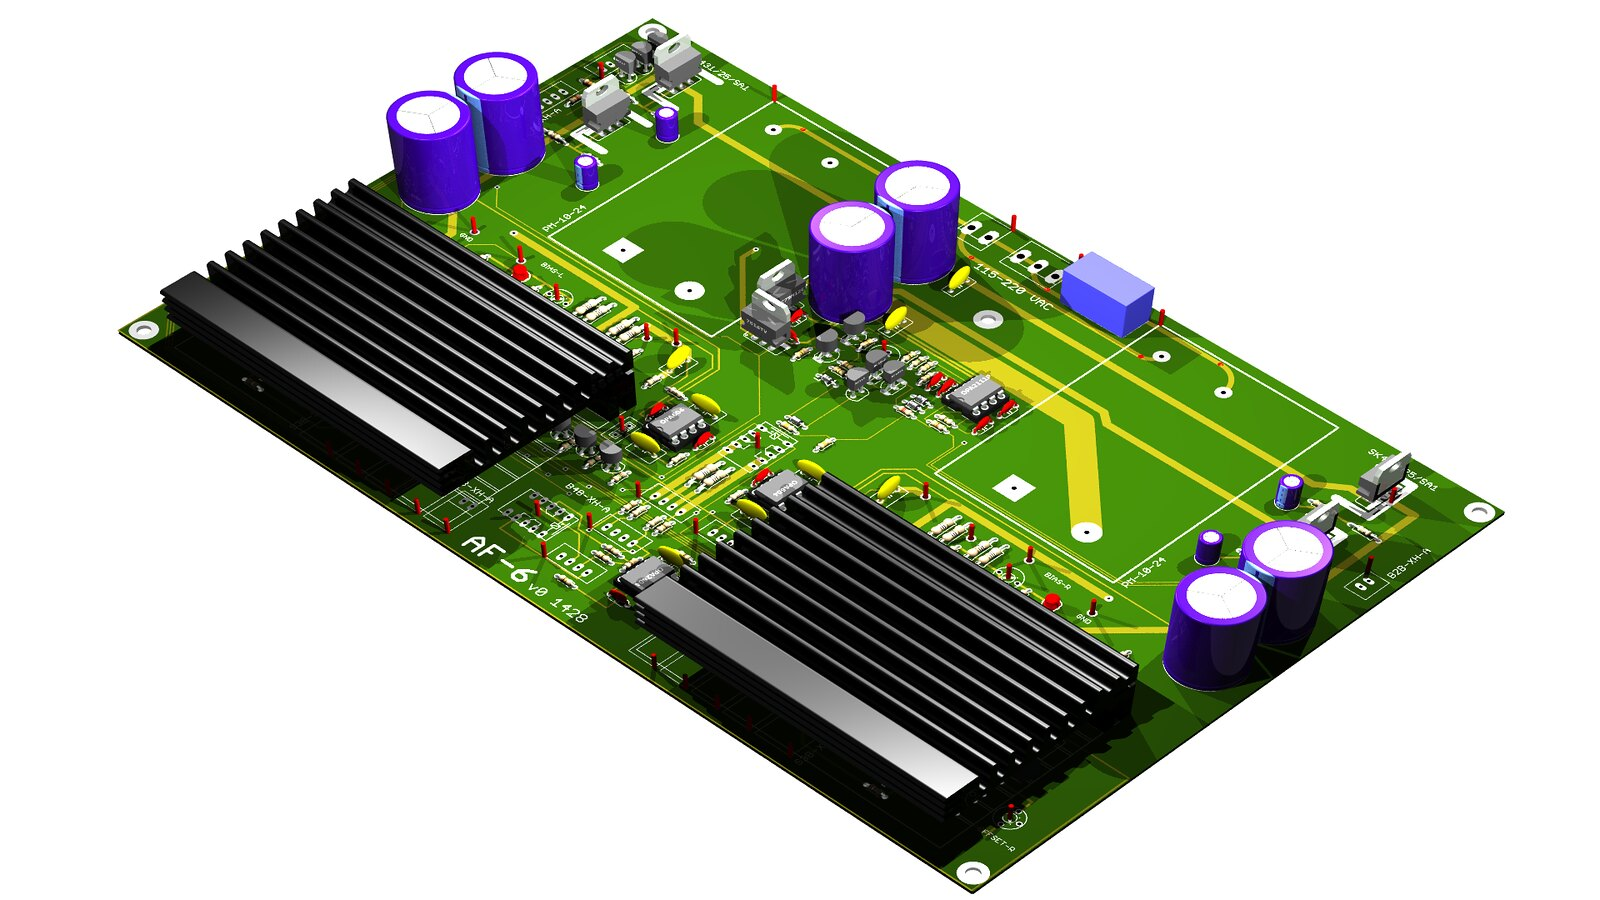 AF-6: Il circuito stampato - Pagina 3 14443832318_34475bfd75_h_d